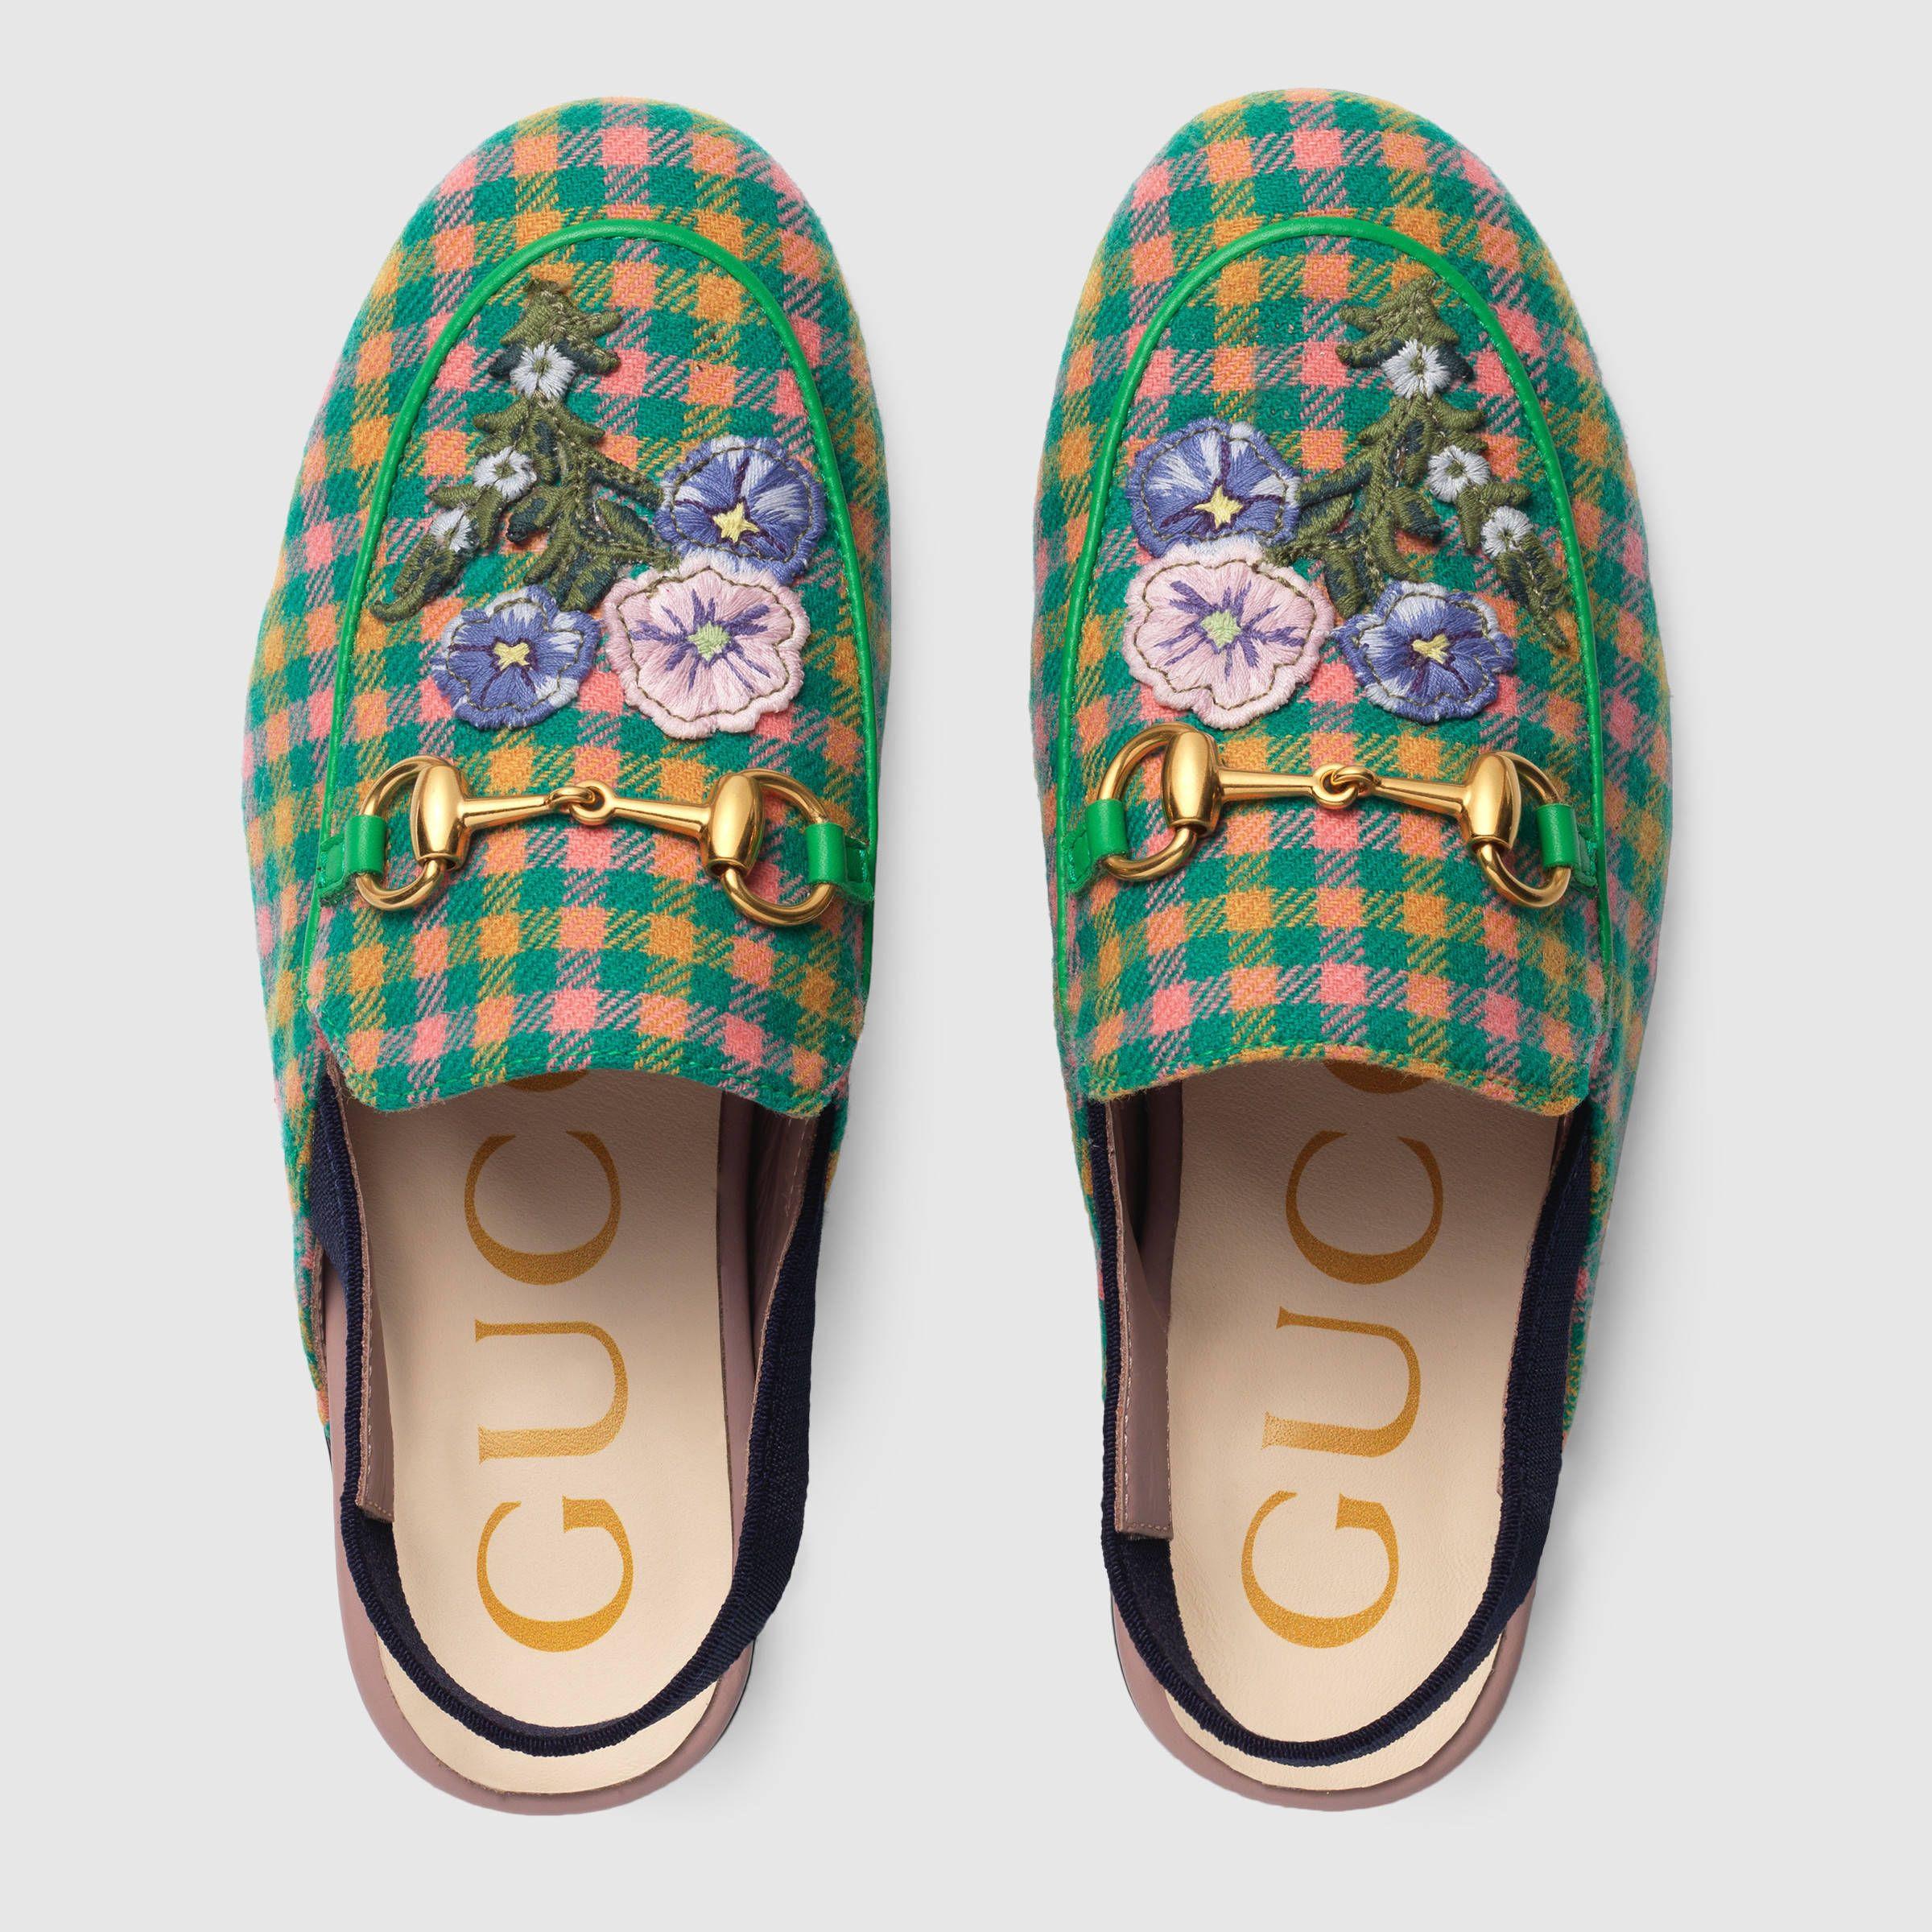 47802ceeab Gucci Children's Princetown slipper with appliqués Detail 3 ...